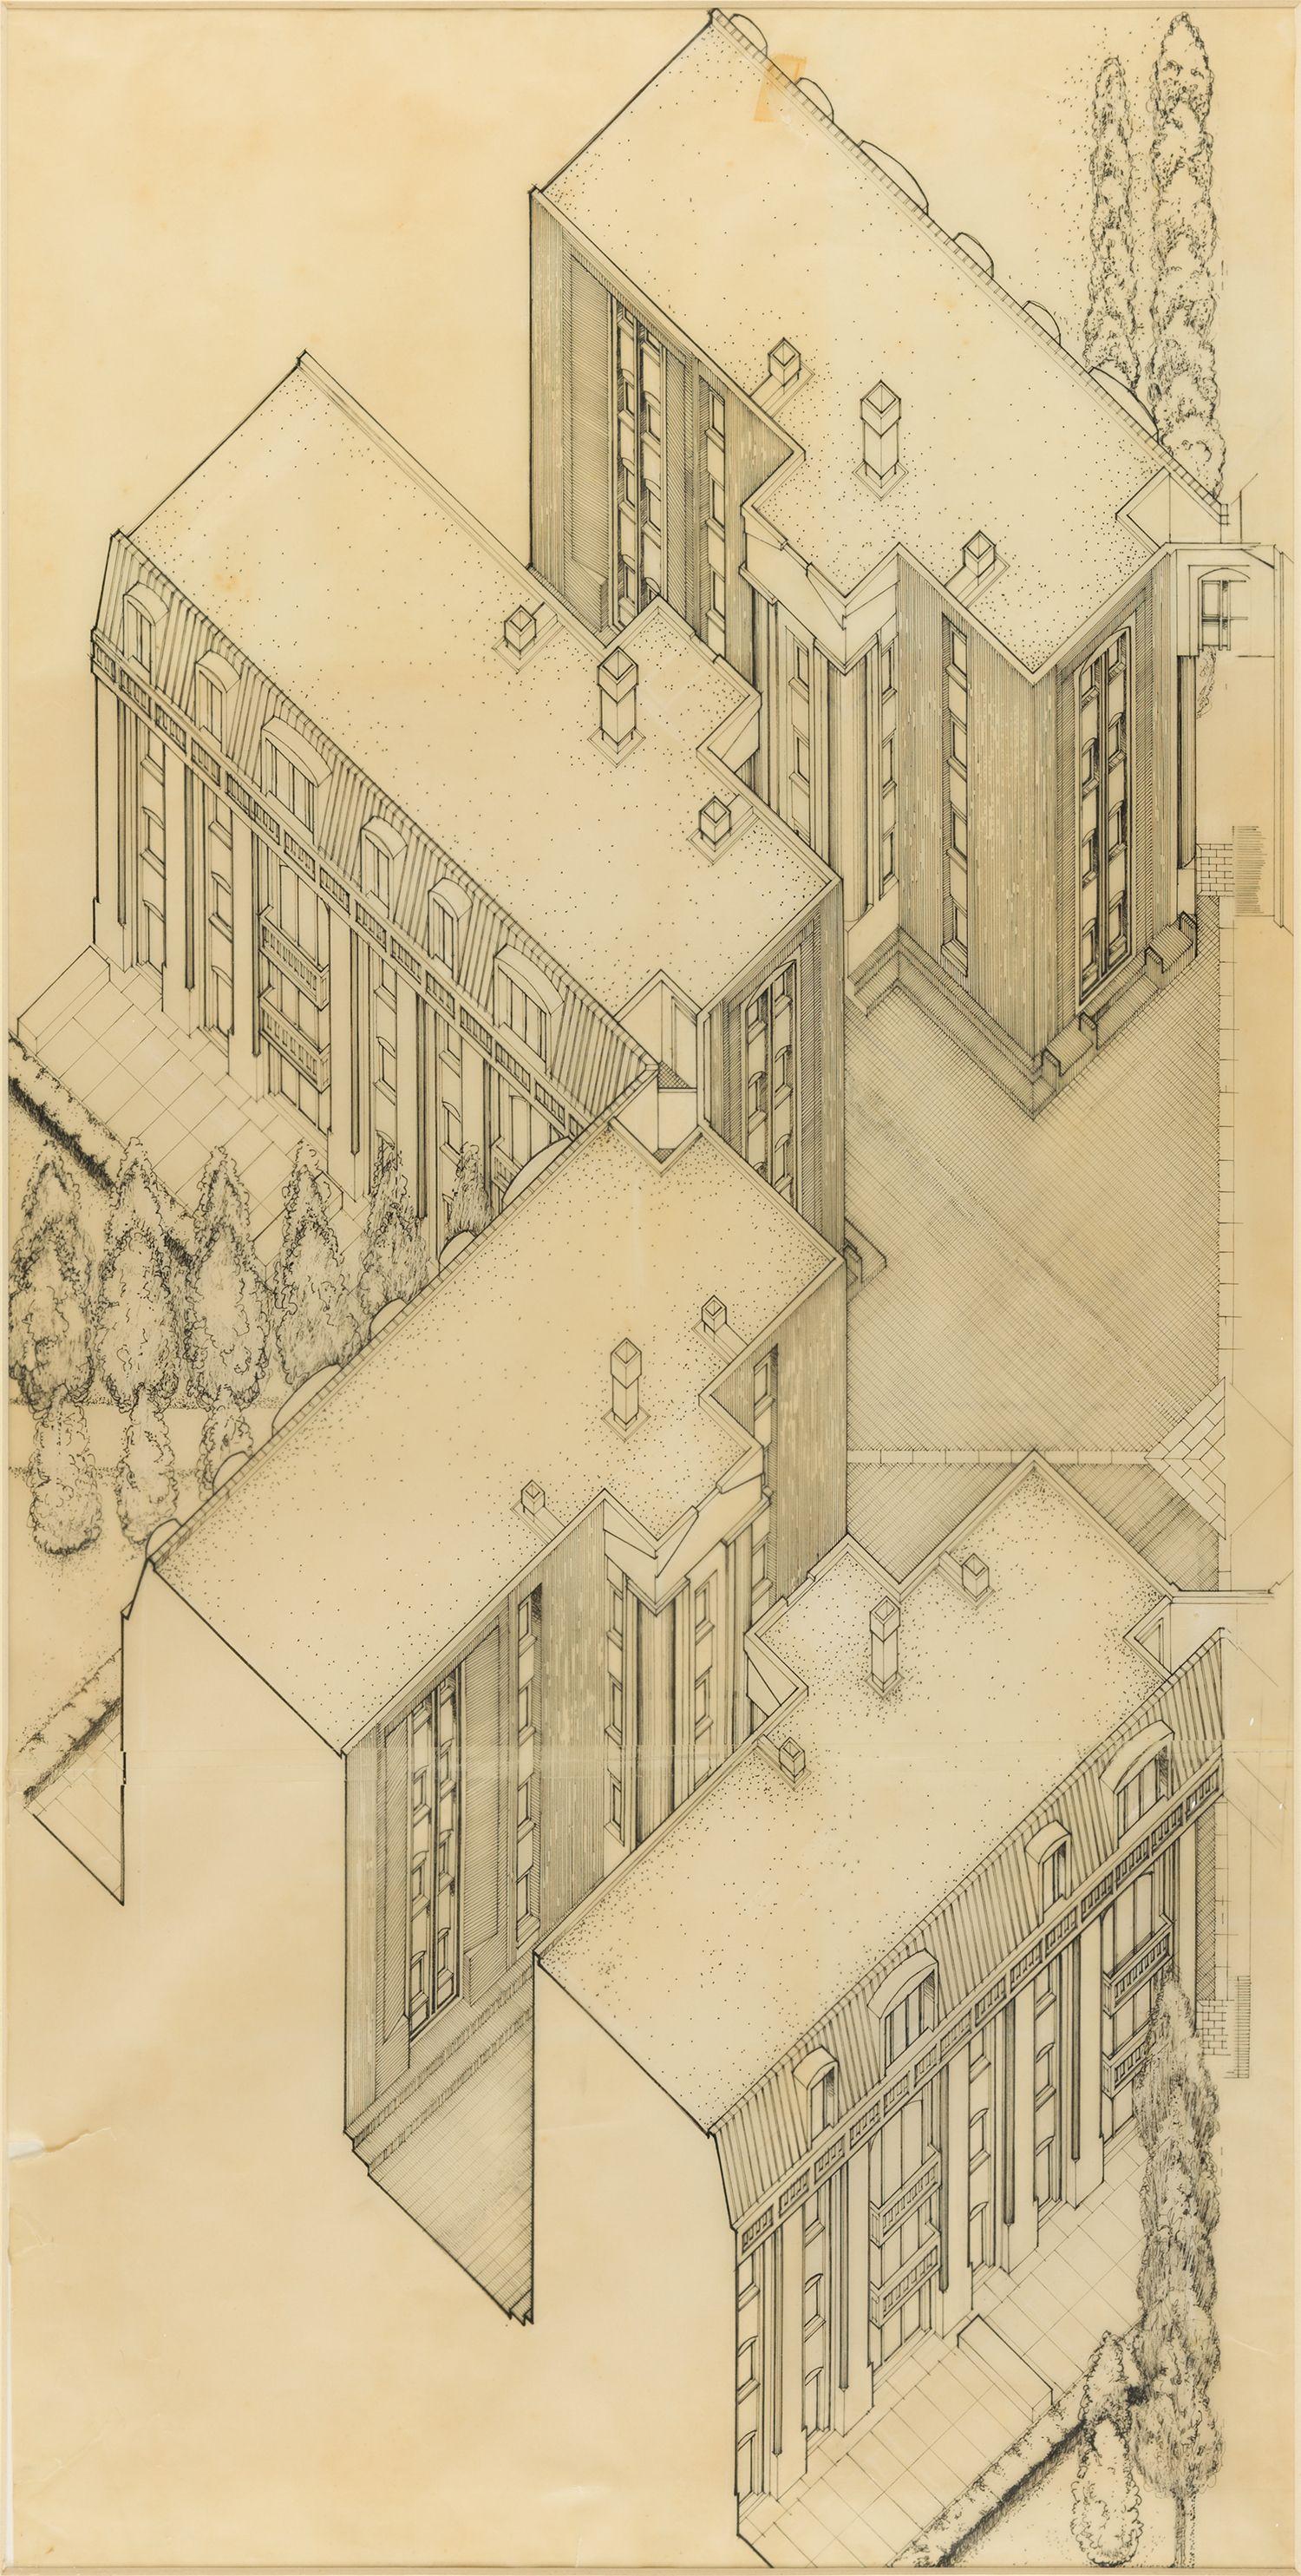 Les Arcades Du Lac Le Viaduc In France By Ricardo Bofill Architecture Graphics Arcade France